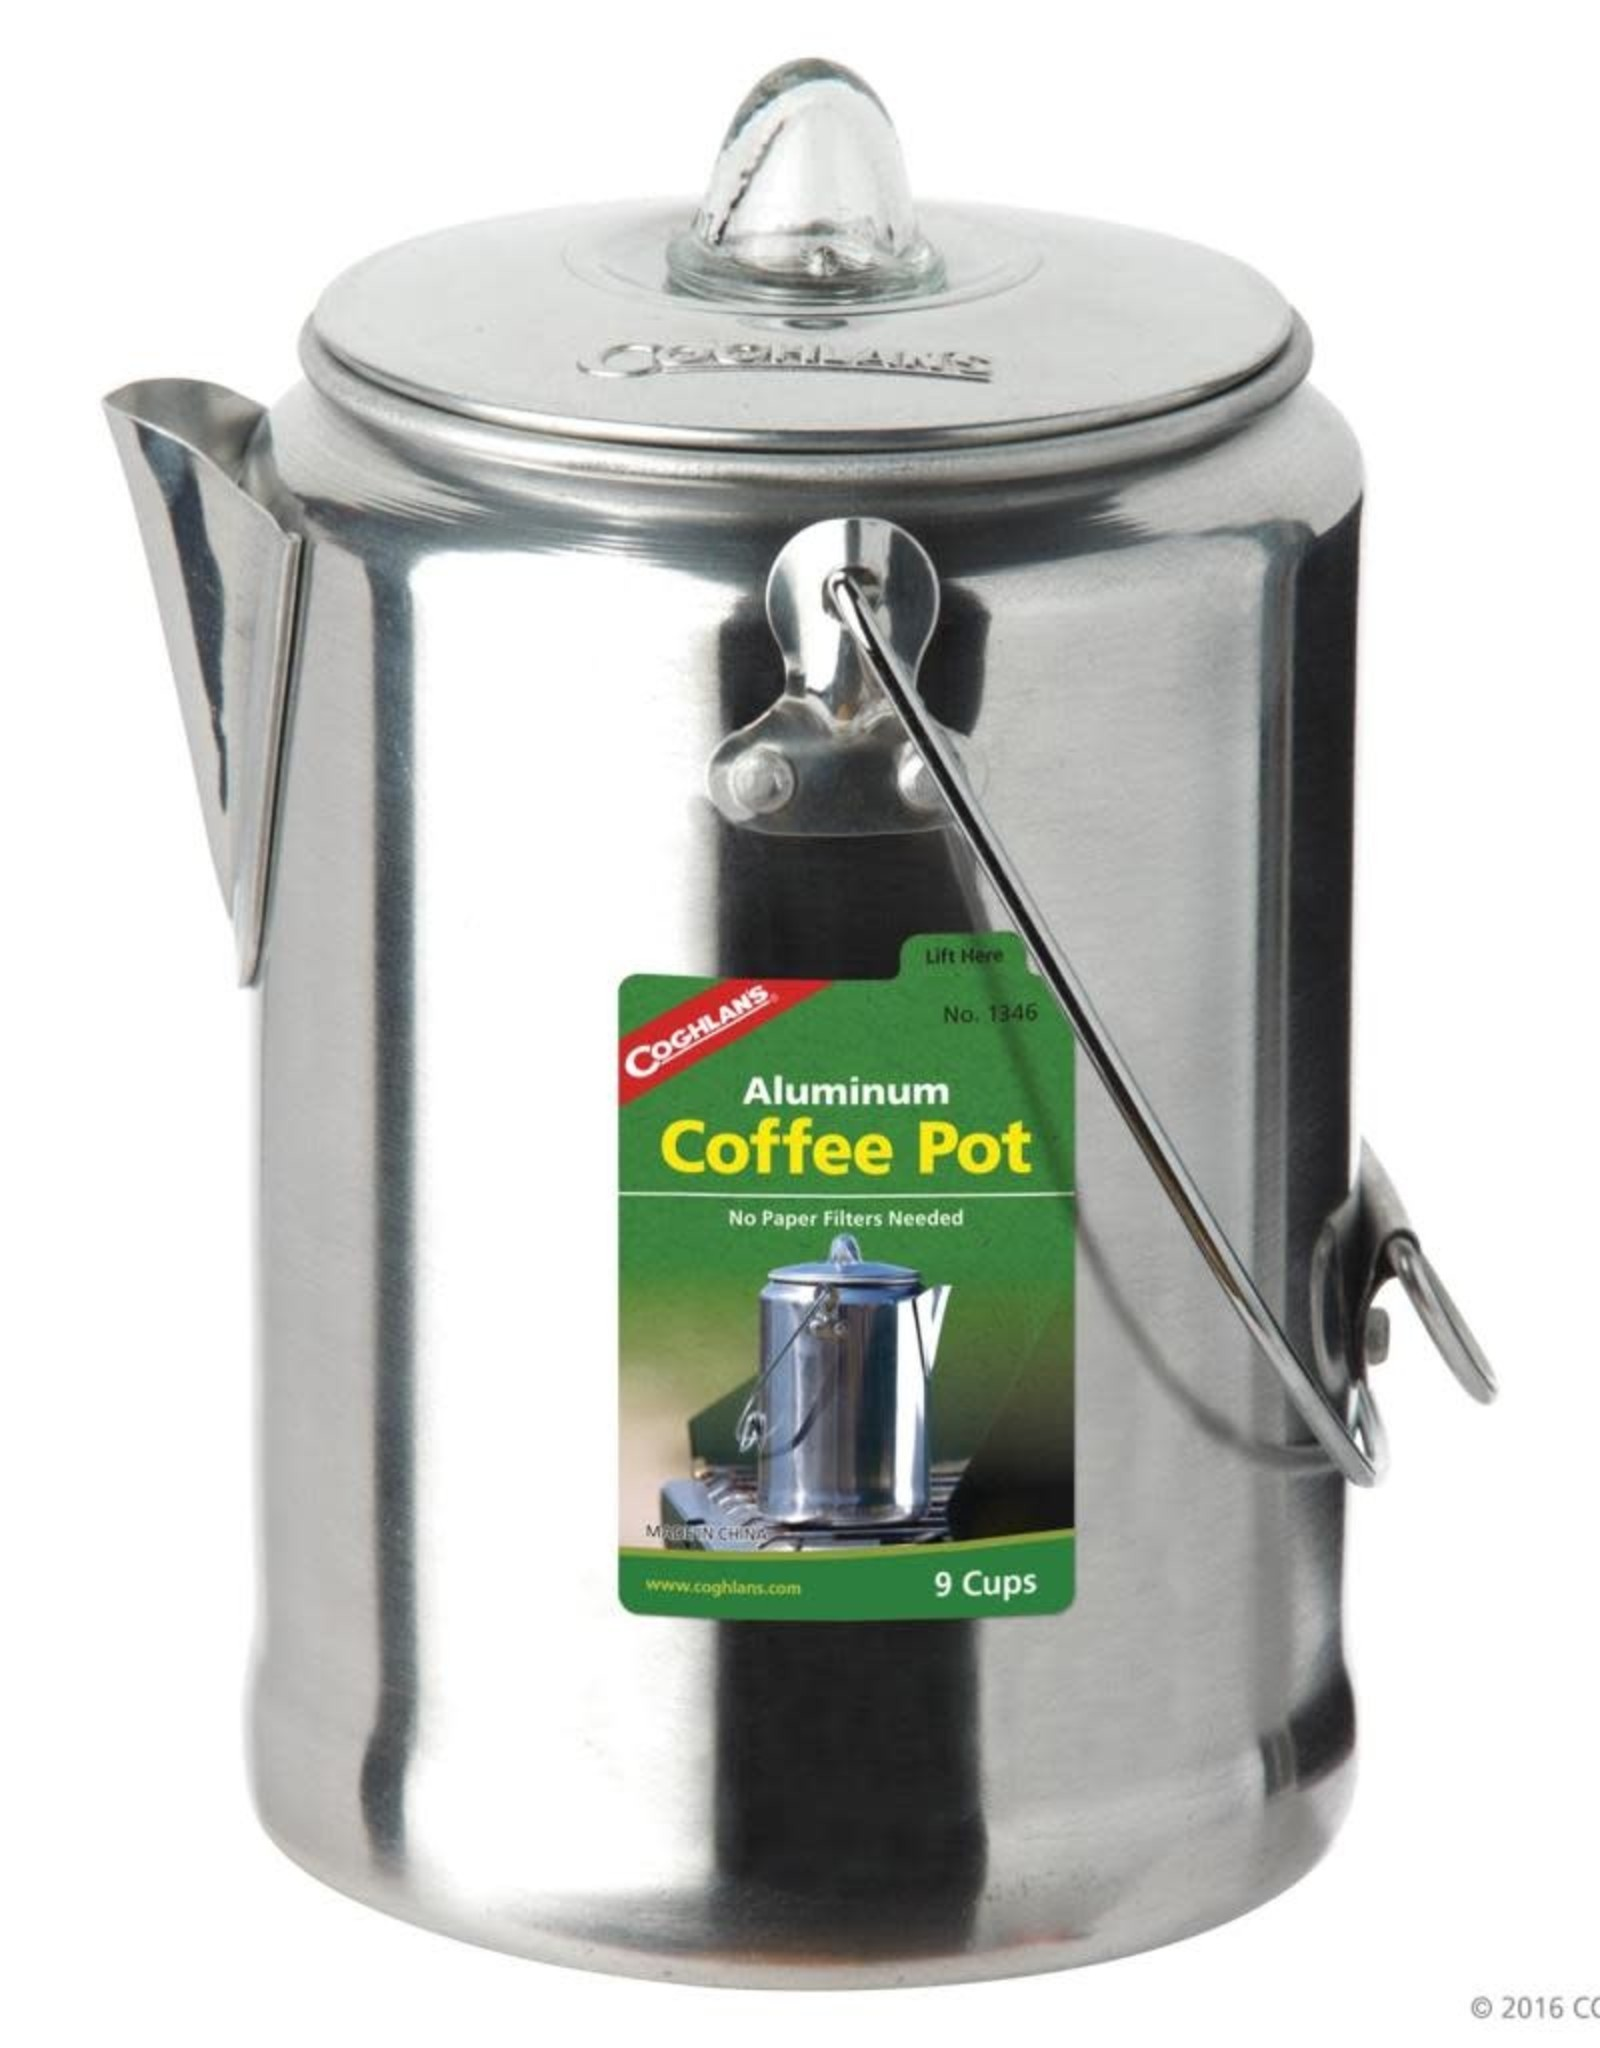 Coghlan's Aluminum Coffee Pot 9 Cup